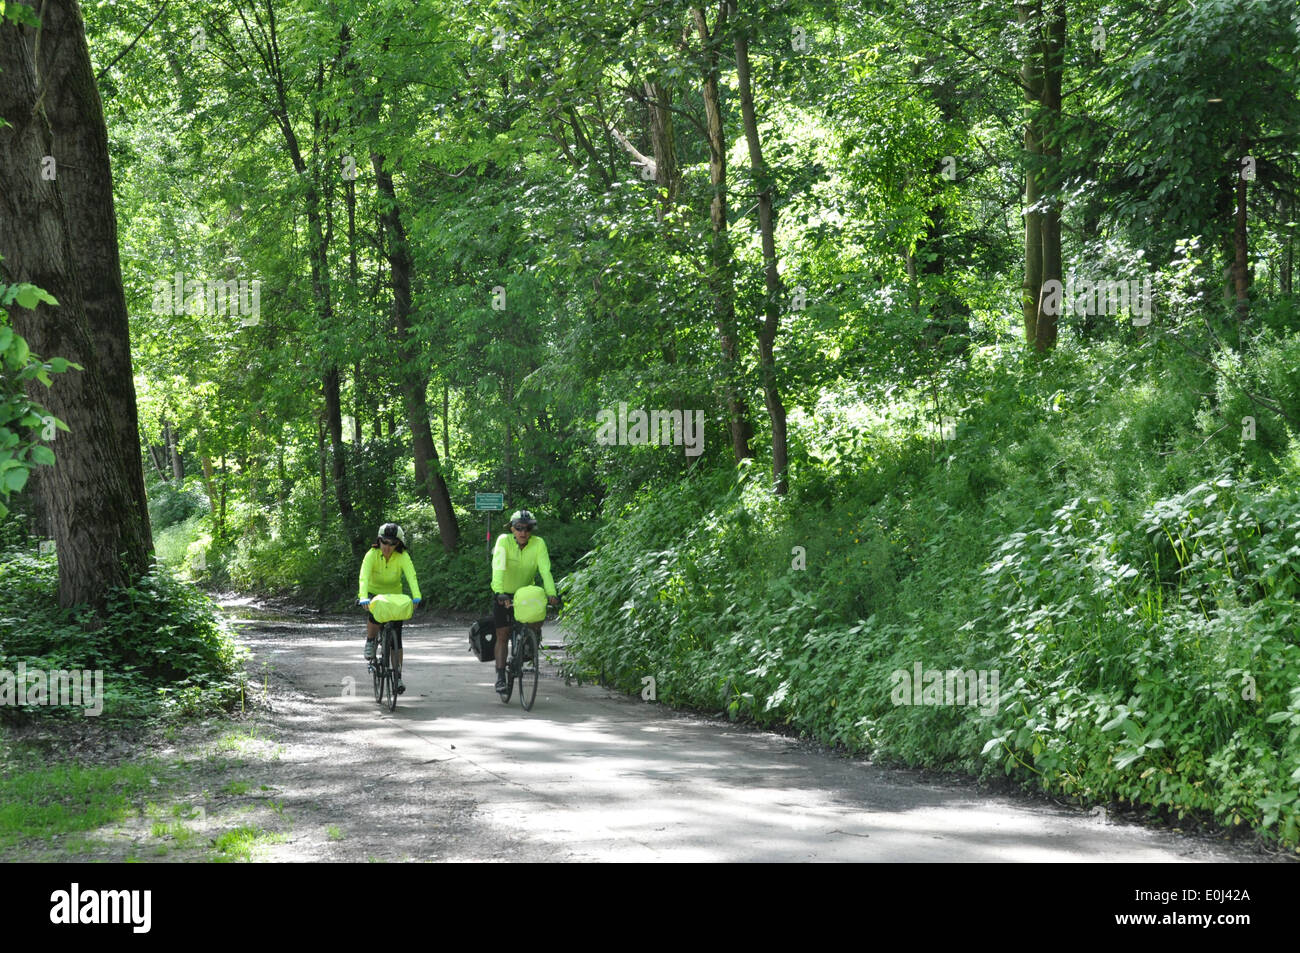 two-australian-cyclists-riding-their-bikes-in-a-natural-park-along-E0J42A.jpg